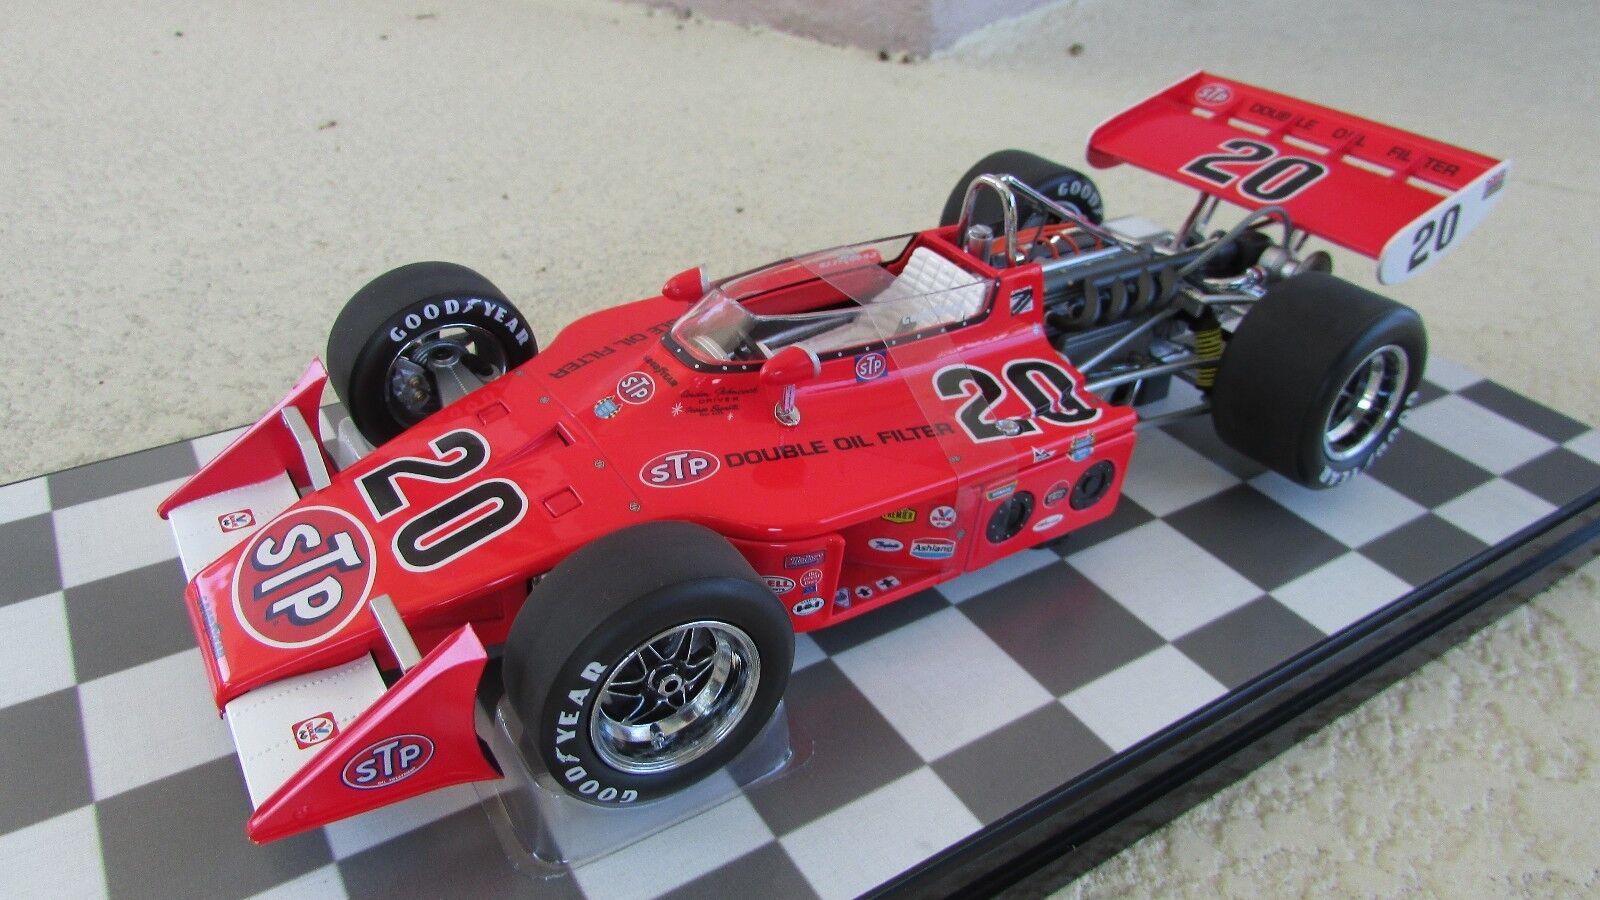 Carousel 1 Gordon Johncock STP Patrick Eagle Offy 1973 Indy 500 ganador 1 18 Nuevo En Caja